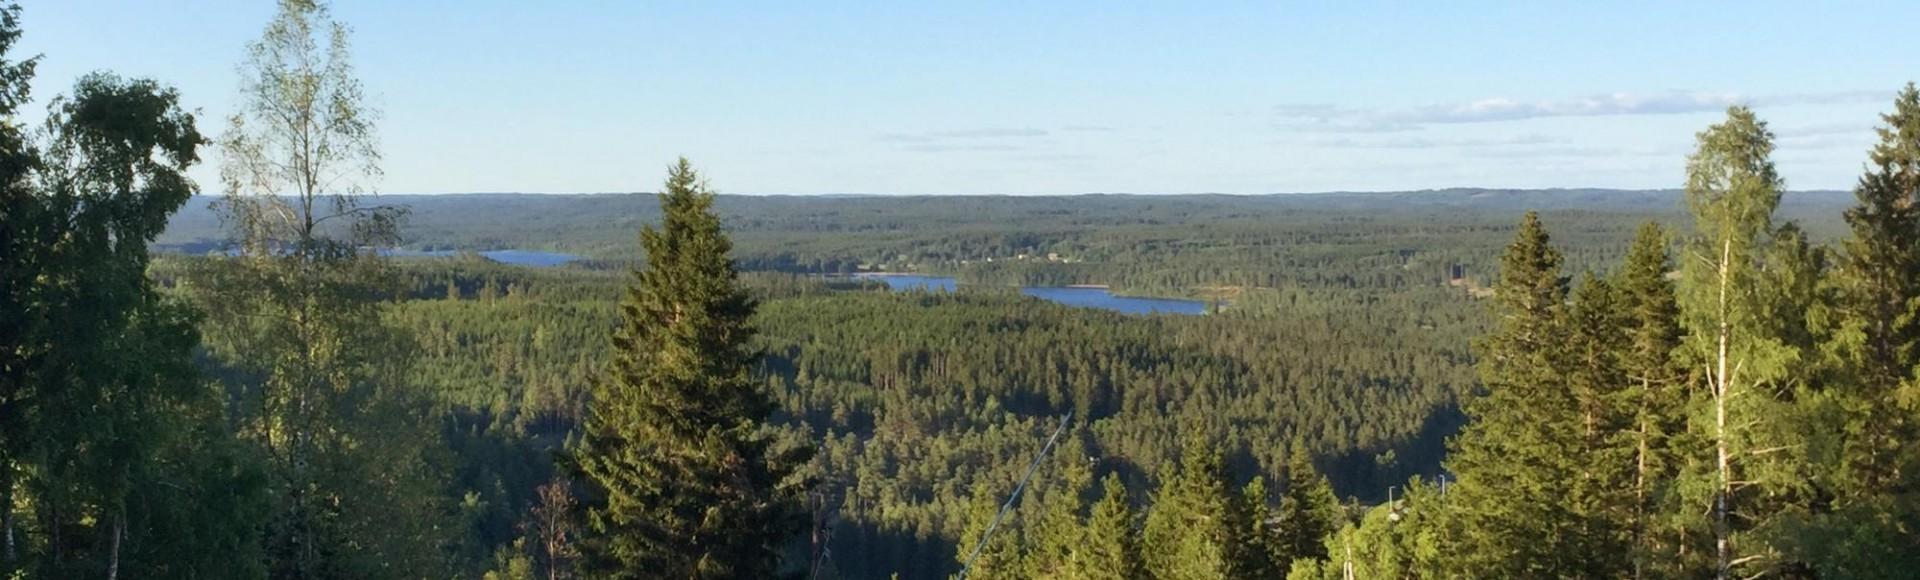 De nieuwste Wandelgids Småland